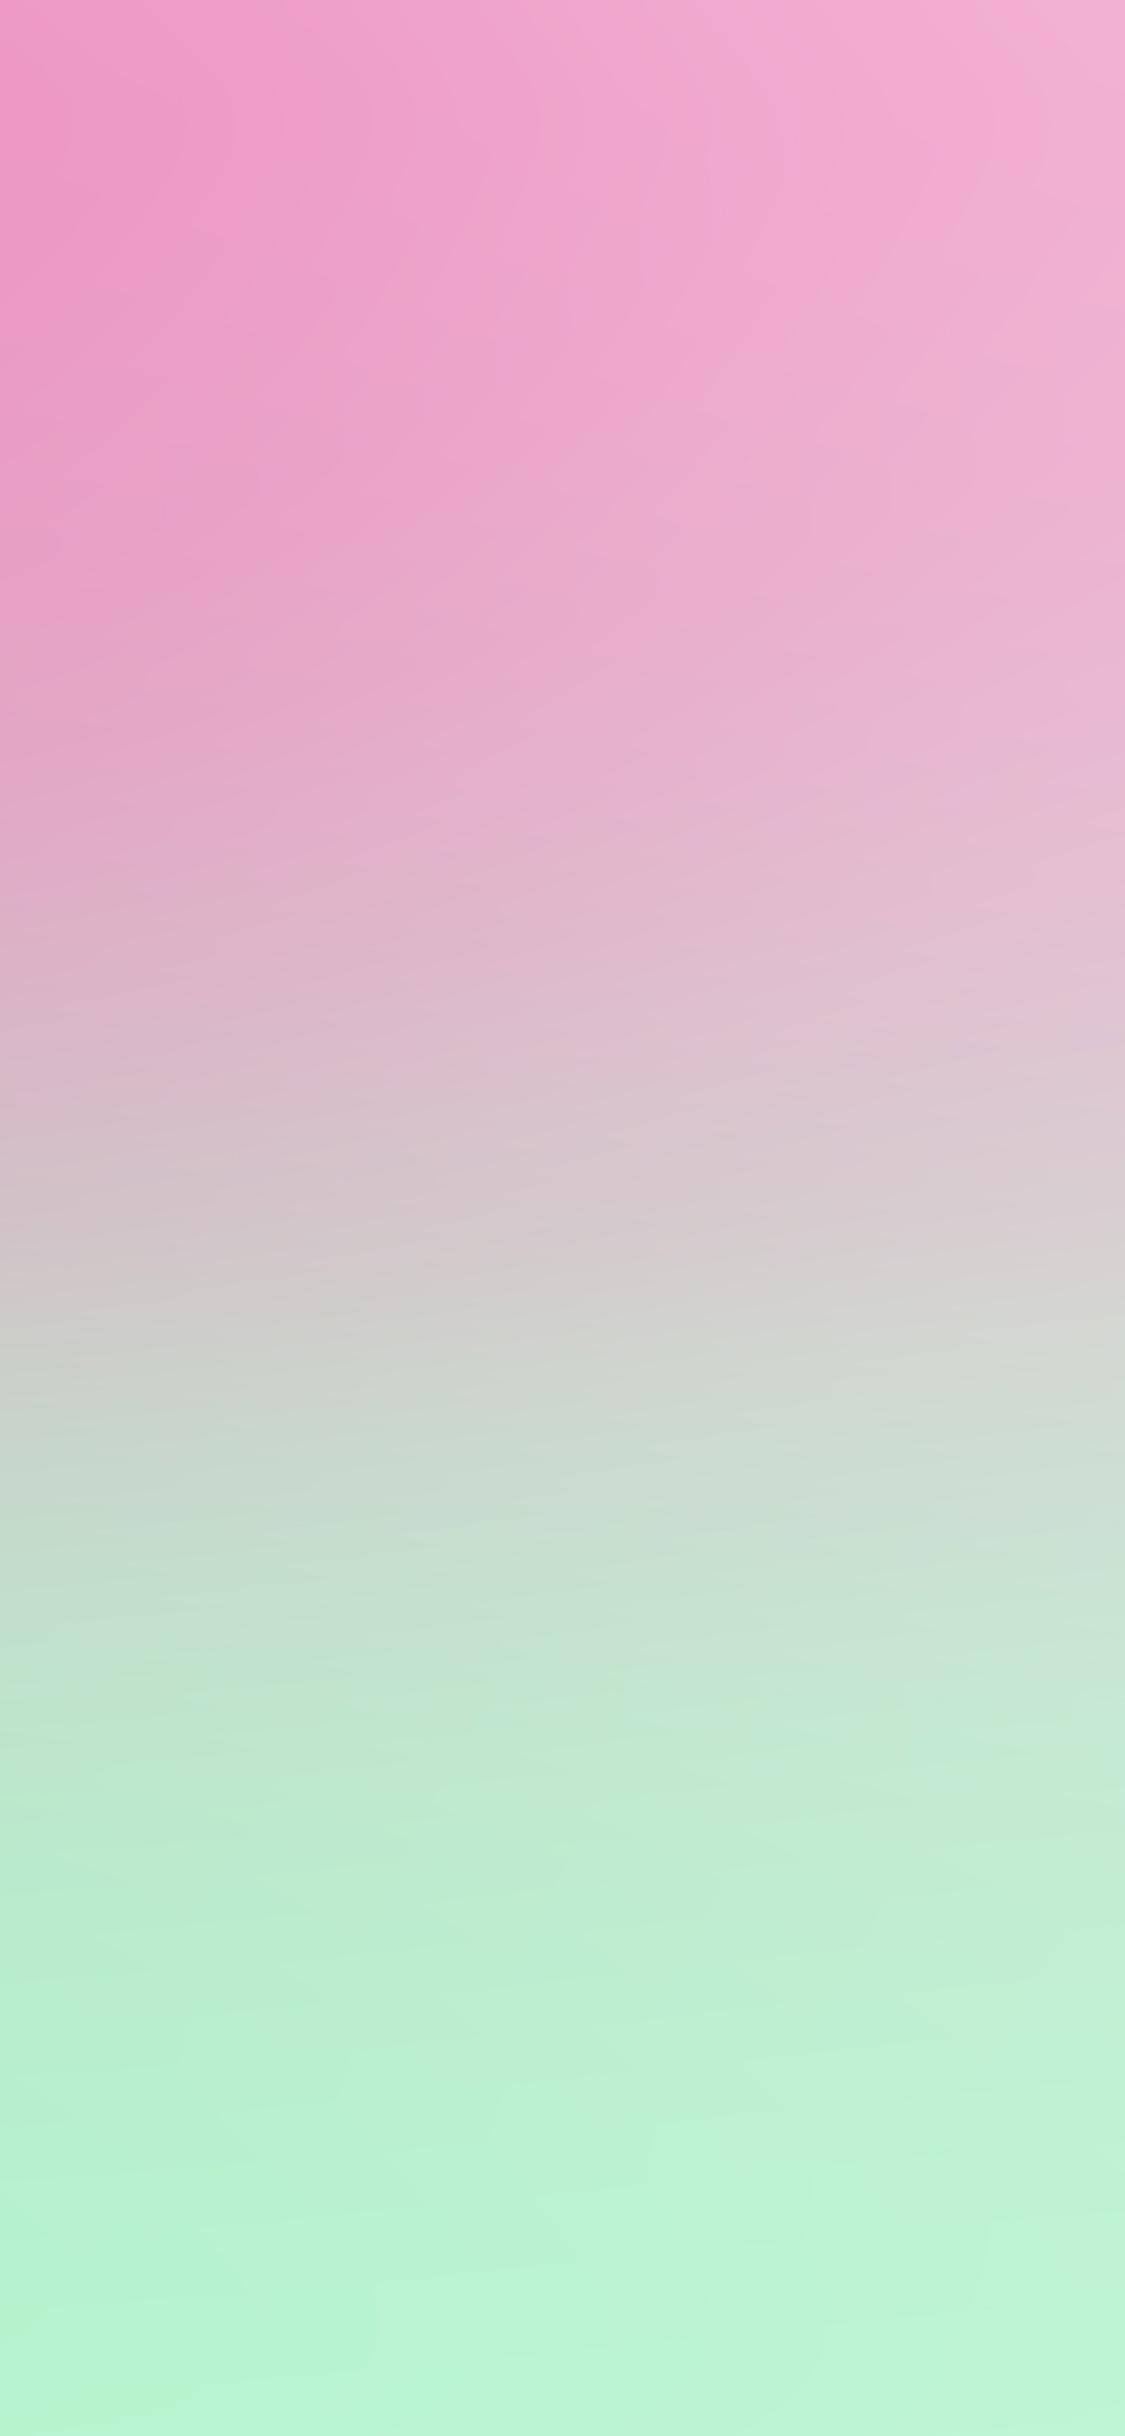 iPhoneXpapers.com-Apple-iPhone-wallpaper-sk77-pink-green-blur-gradation-cola